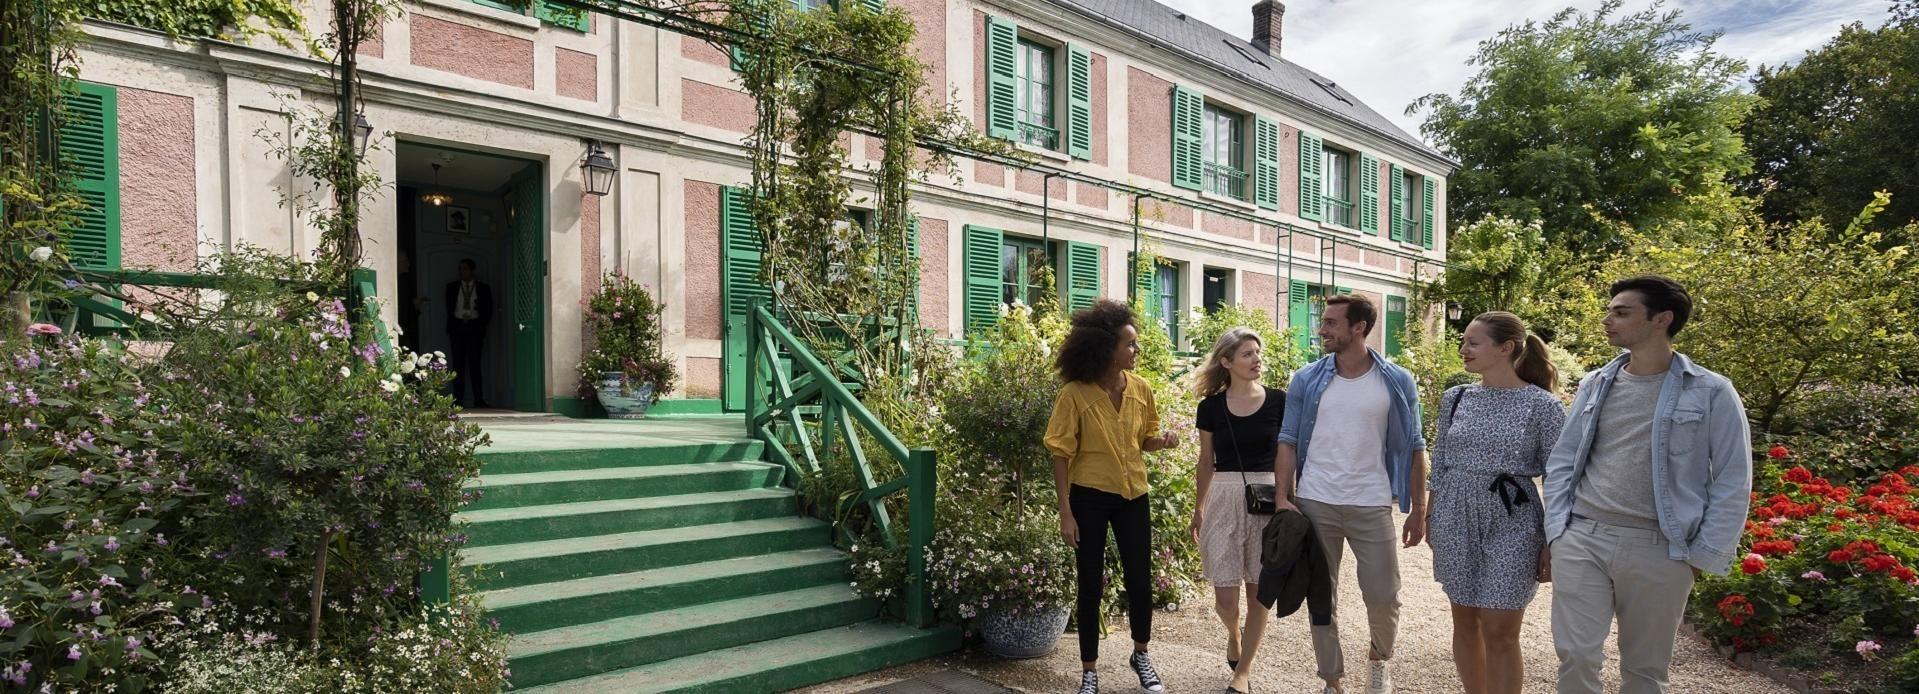 Desde París: tour impresionista de Monet a Giverny